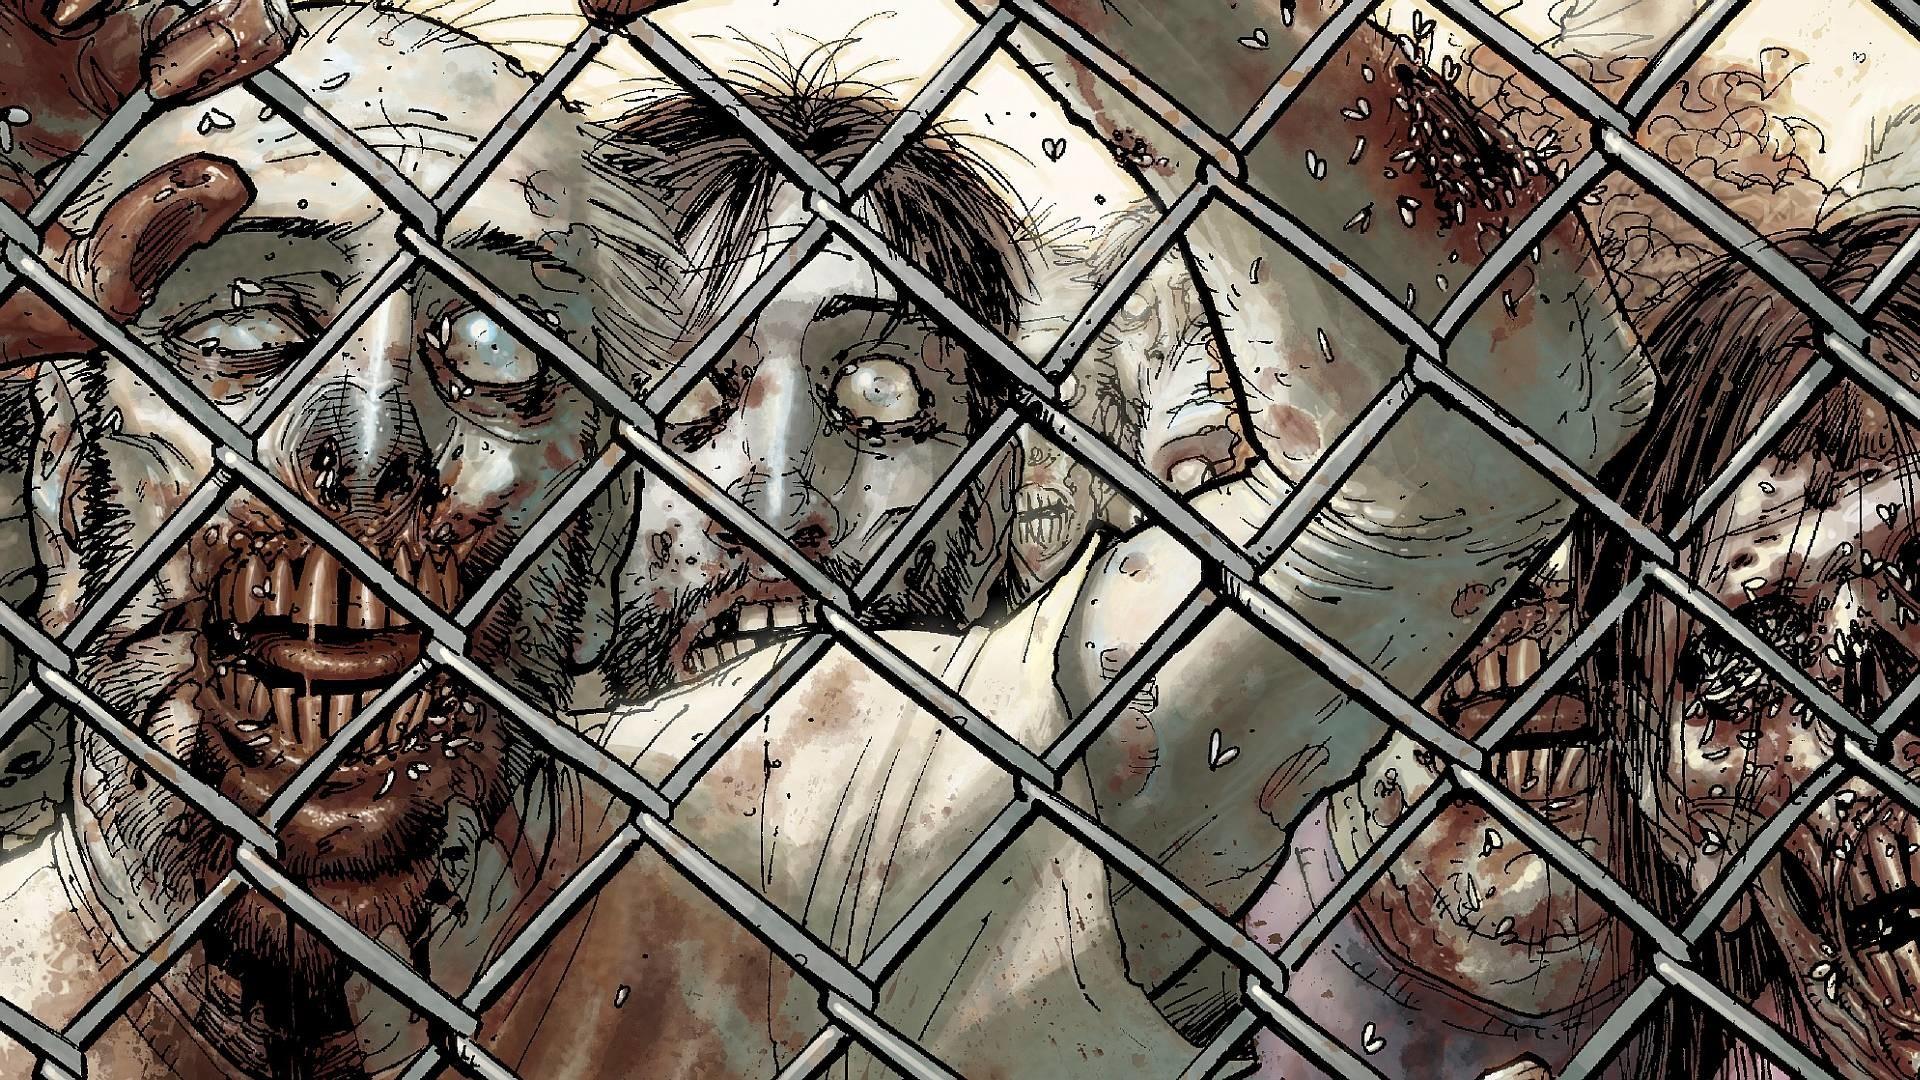 Comics The Walking Dead Wallpaper 1280×800 px Free Download .